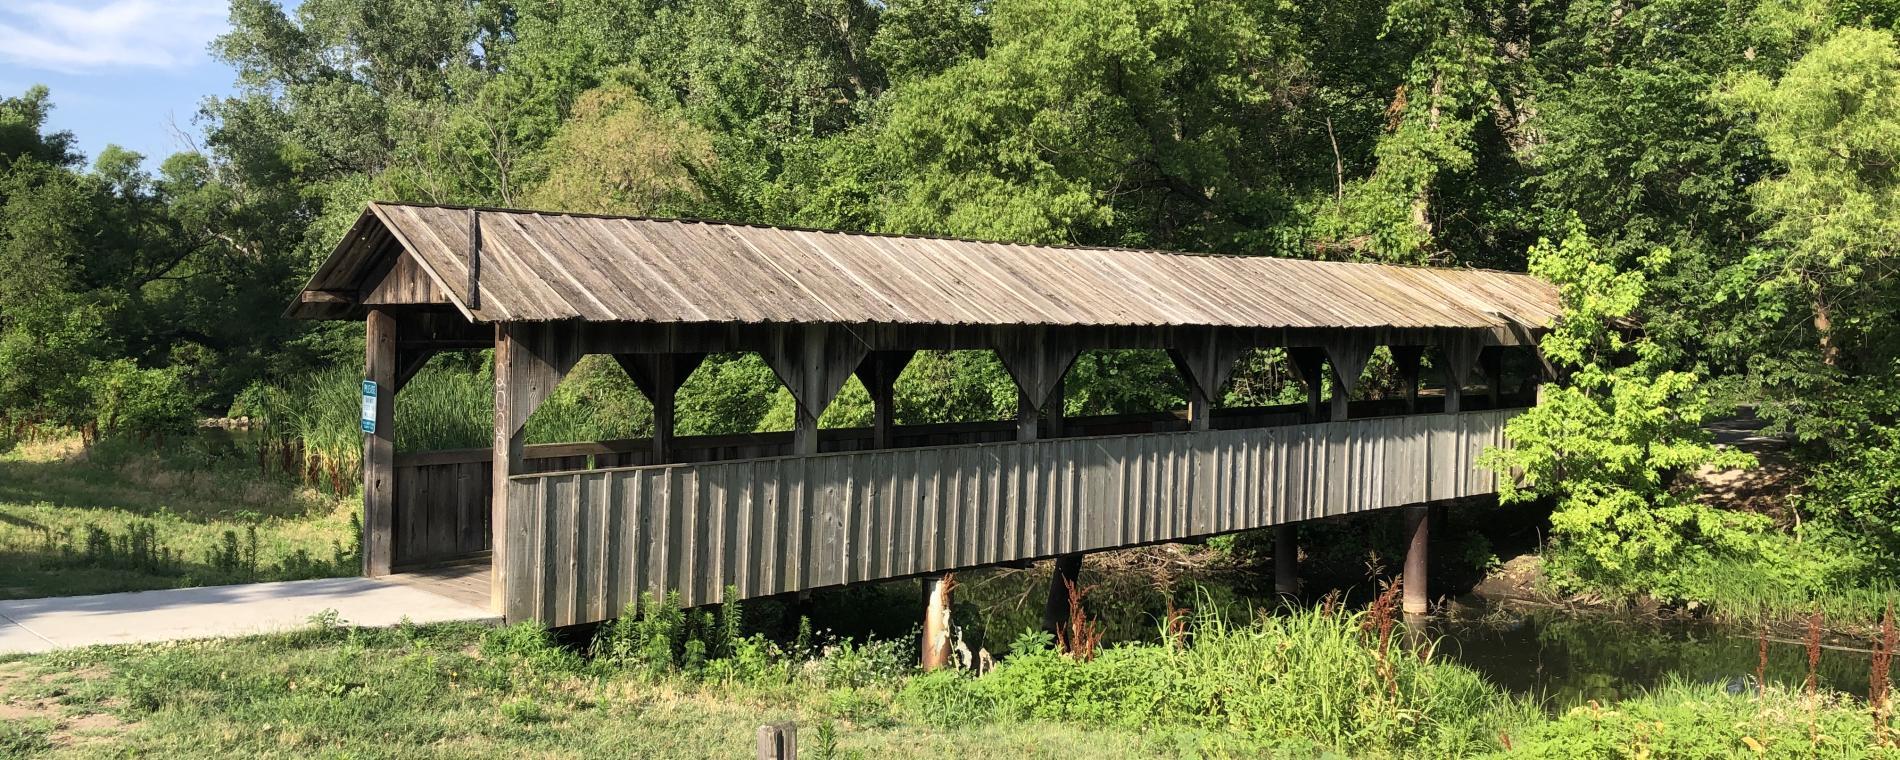 Sedgwick County Park Bridge